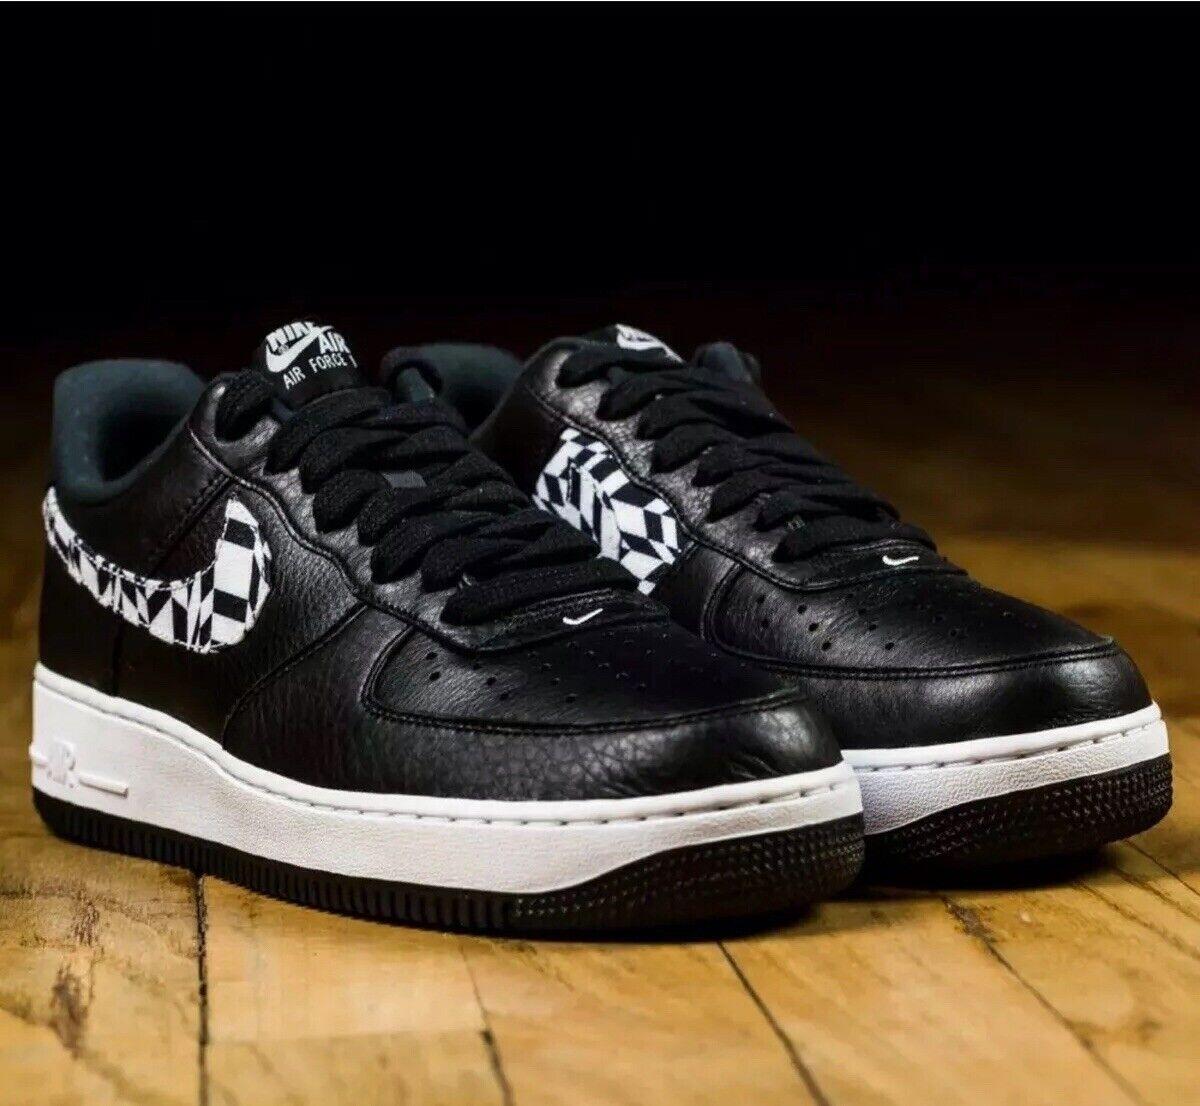 Nike Air Force 1 AOP Premium AQ4131 001 Black White Men SZ 10.5  Leather